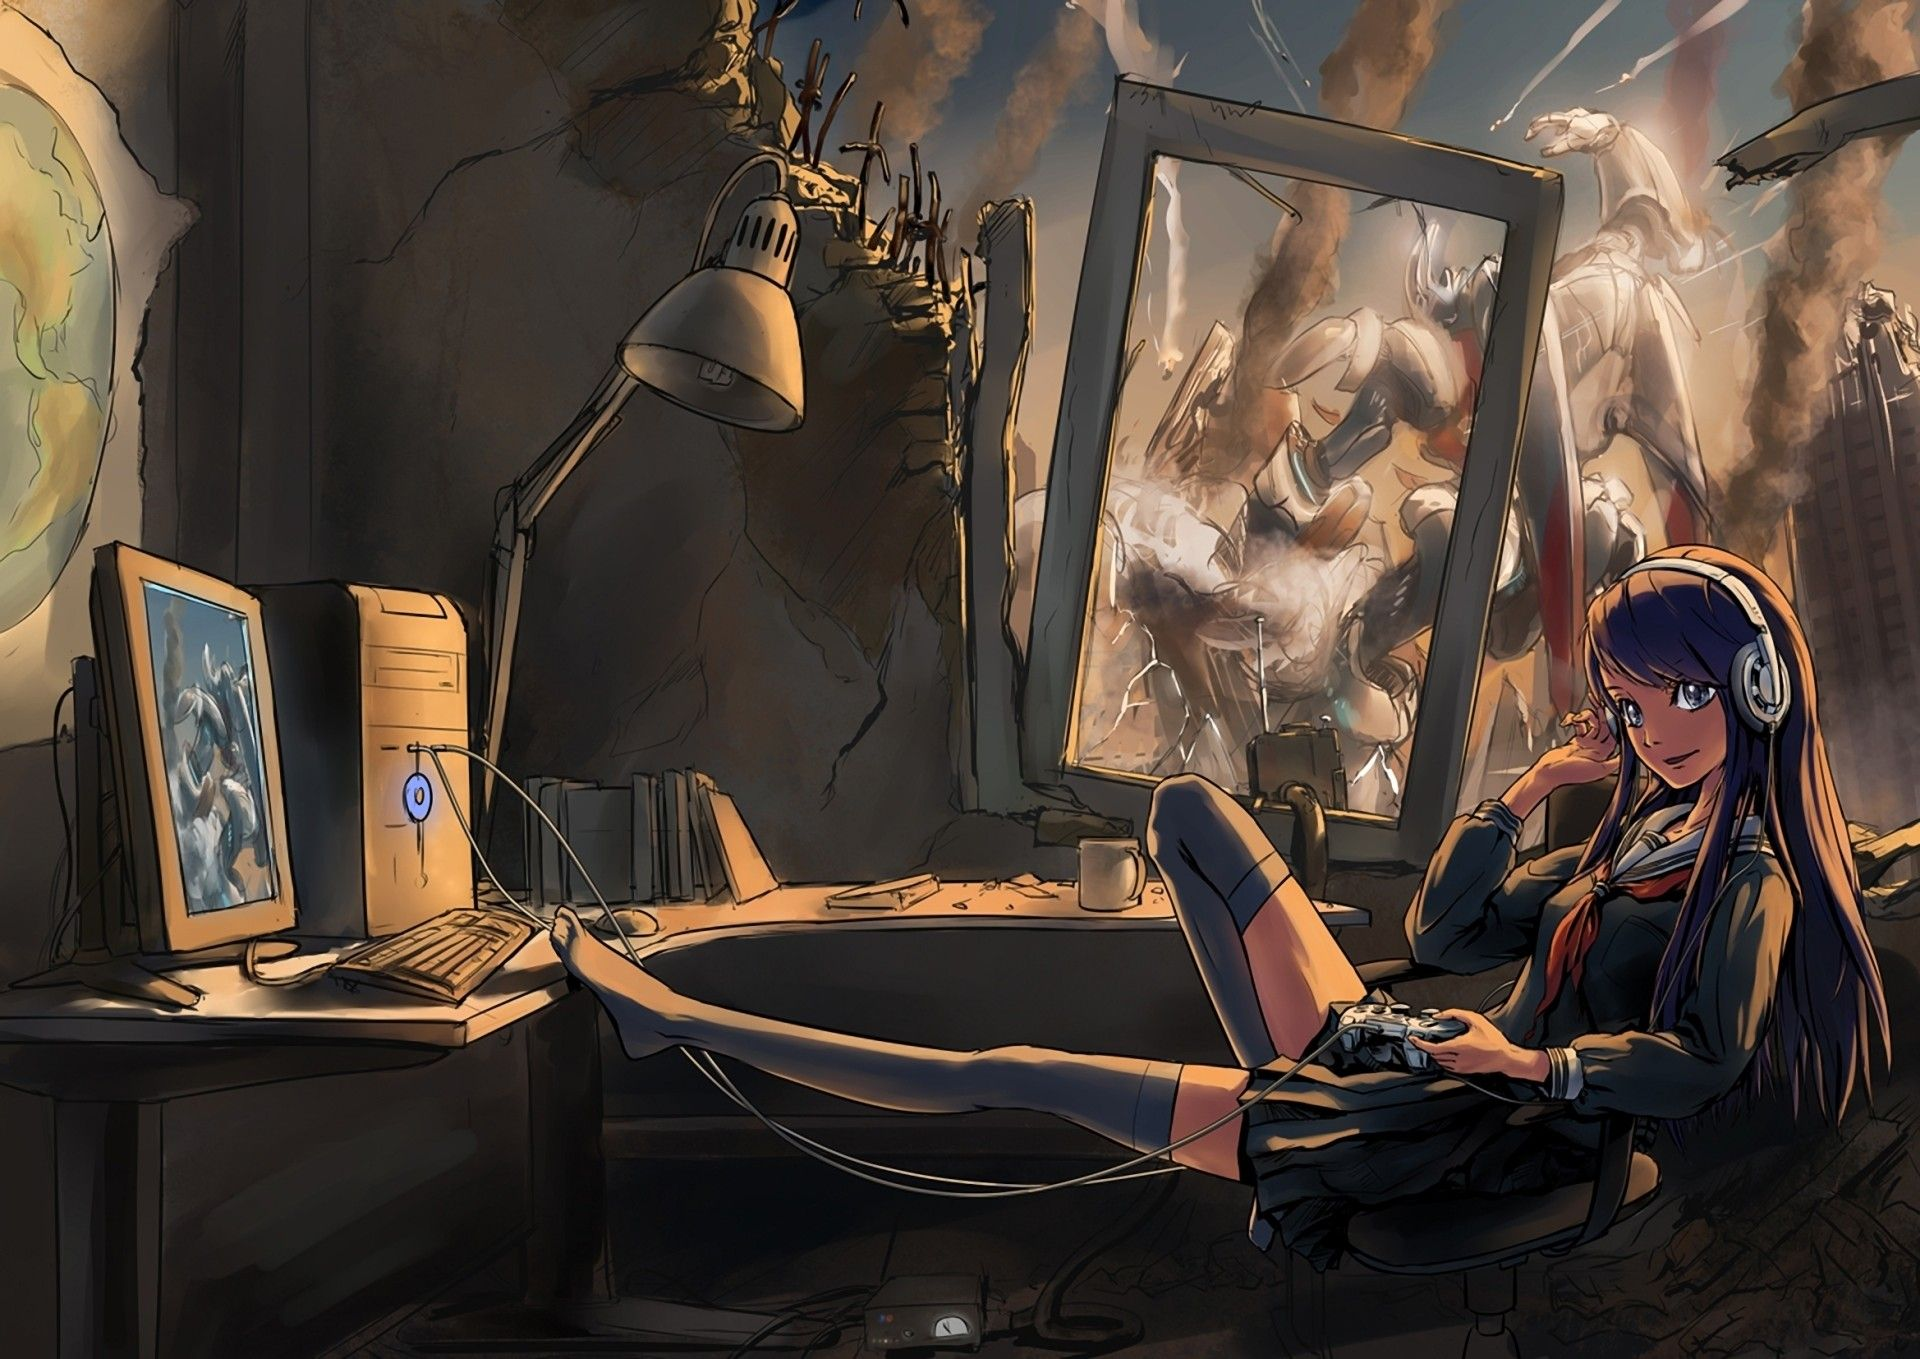 Game Girls Art Wallpapers Top Free Game Girls Art Backgrounds Wallpaperaccess